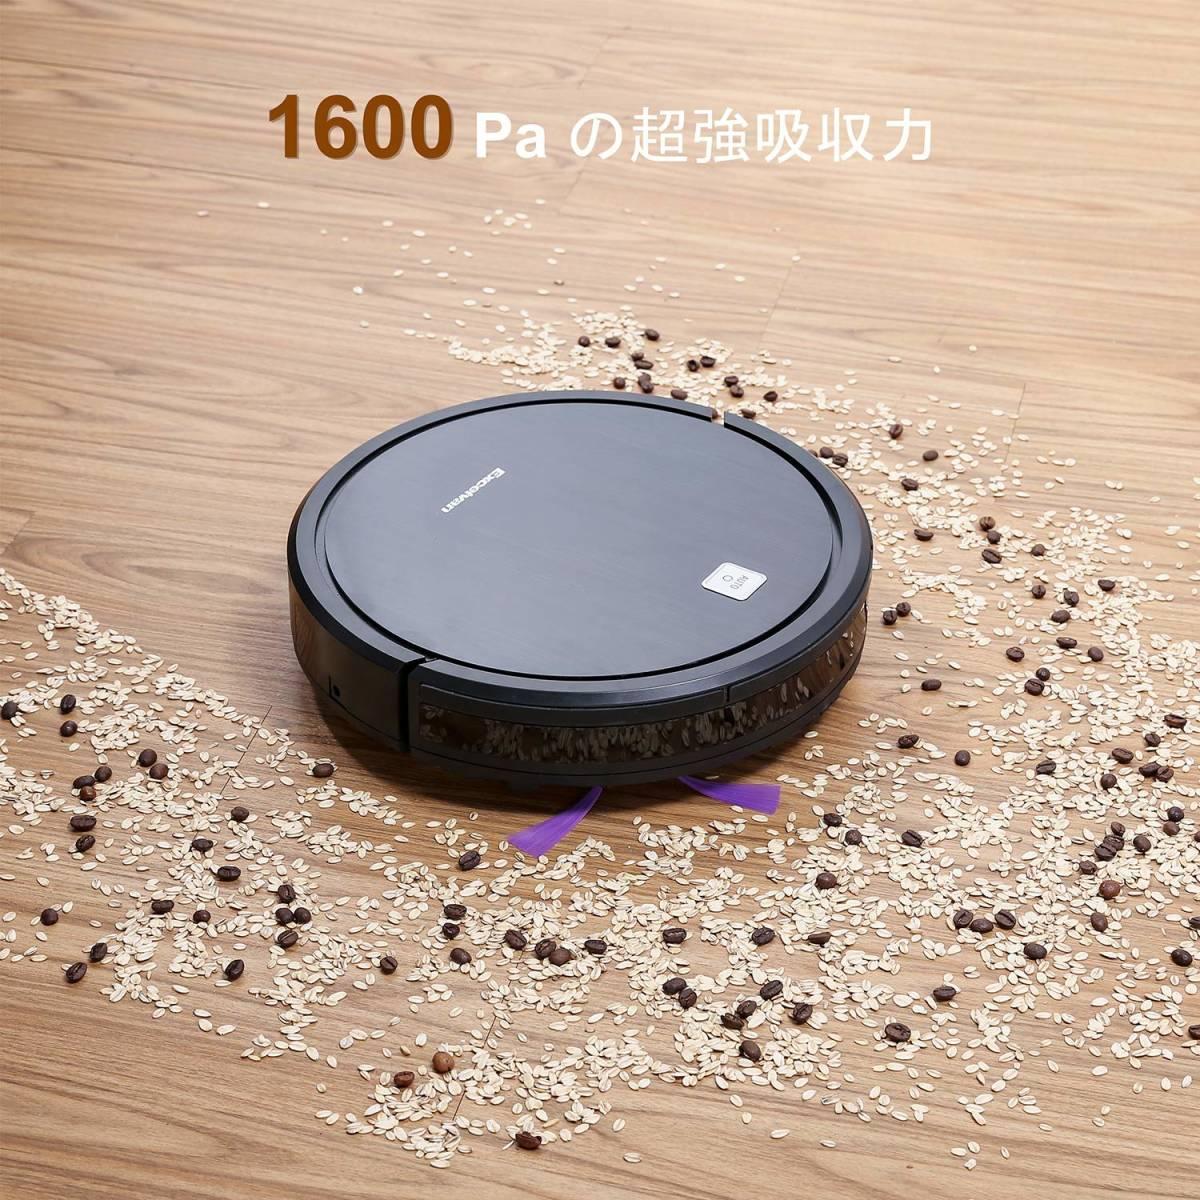 Excelvan D35 ロボット掃除機 スマートな計画式掃除 ロボット型クリーナー 4つの清掃モード 1600Paの強力吸引 120分長時間稼動 自動充電_画像7